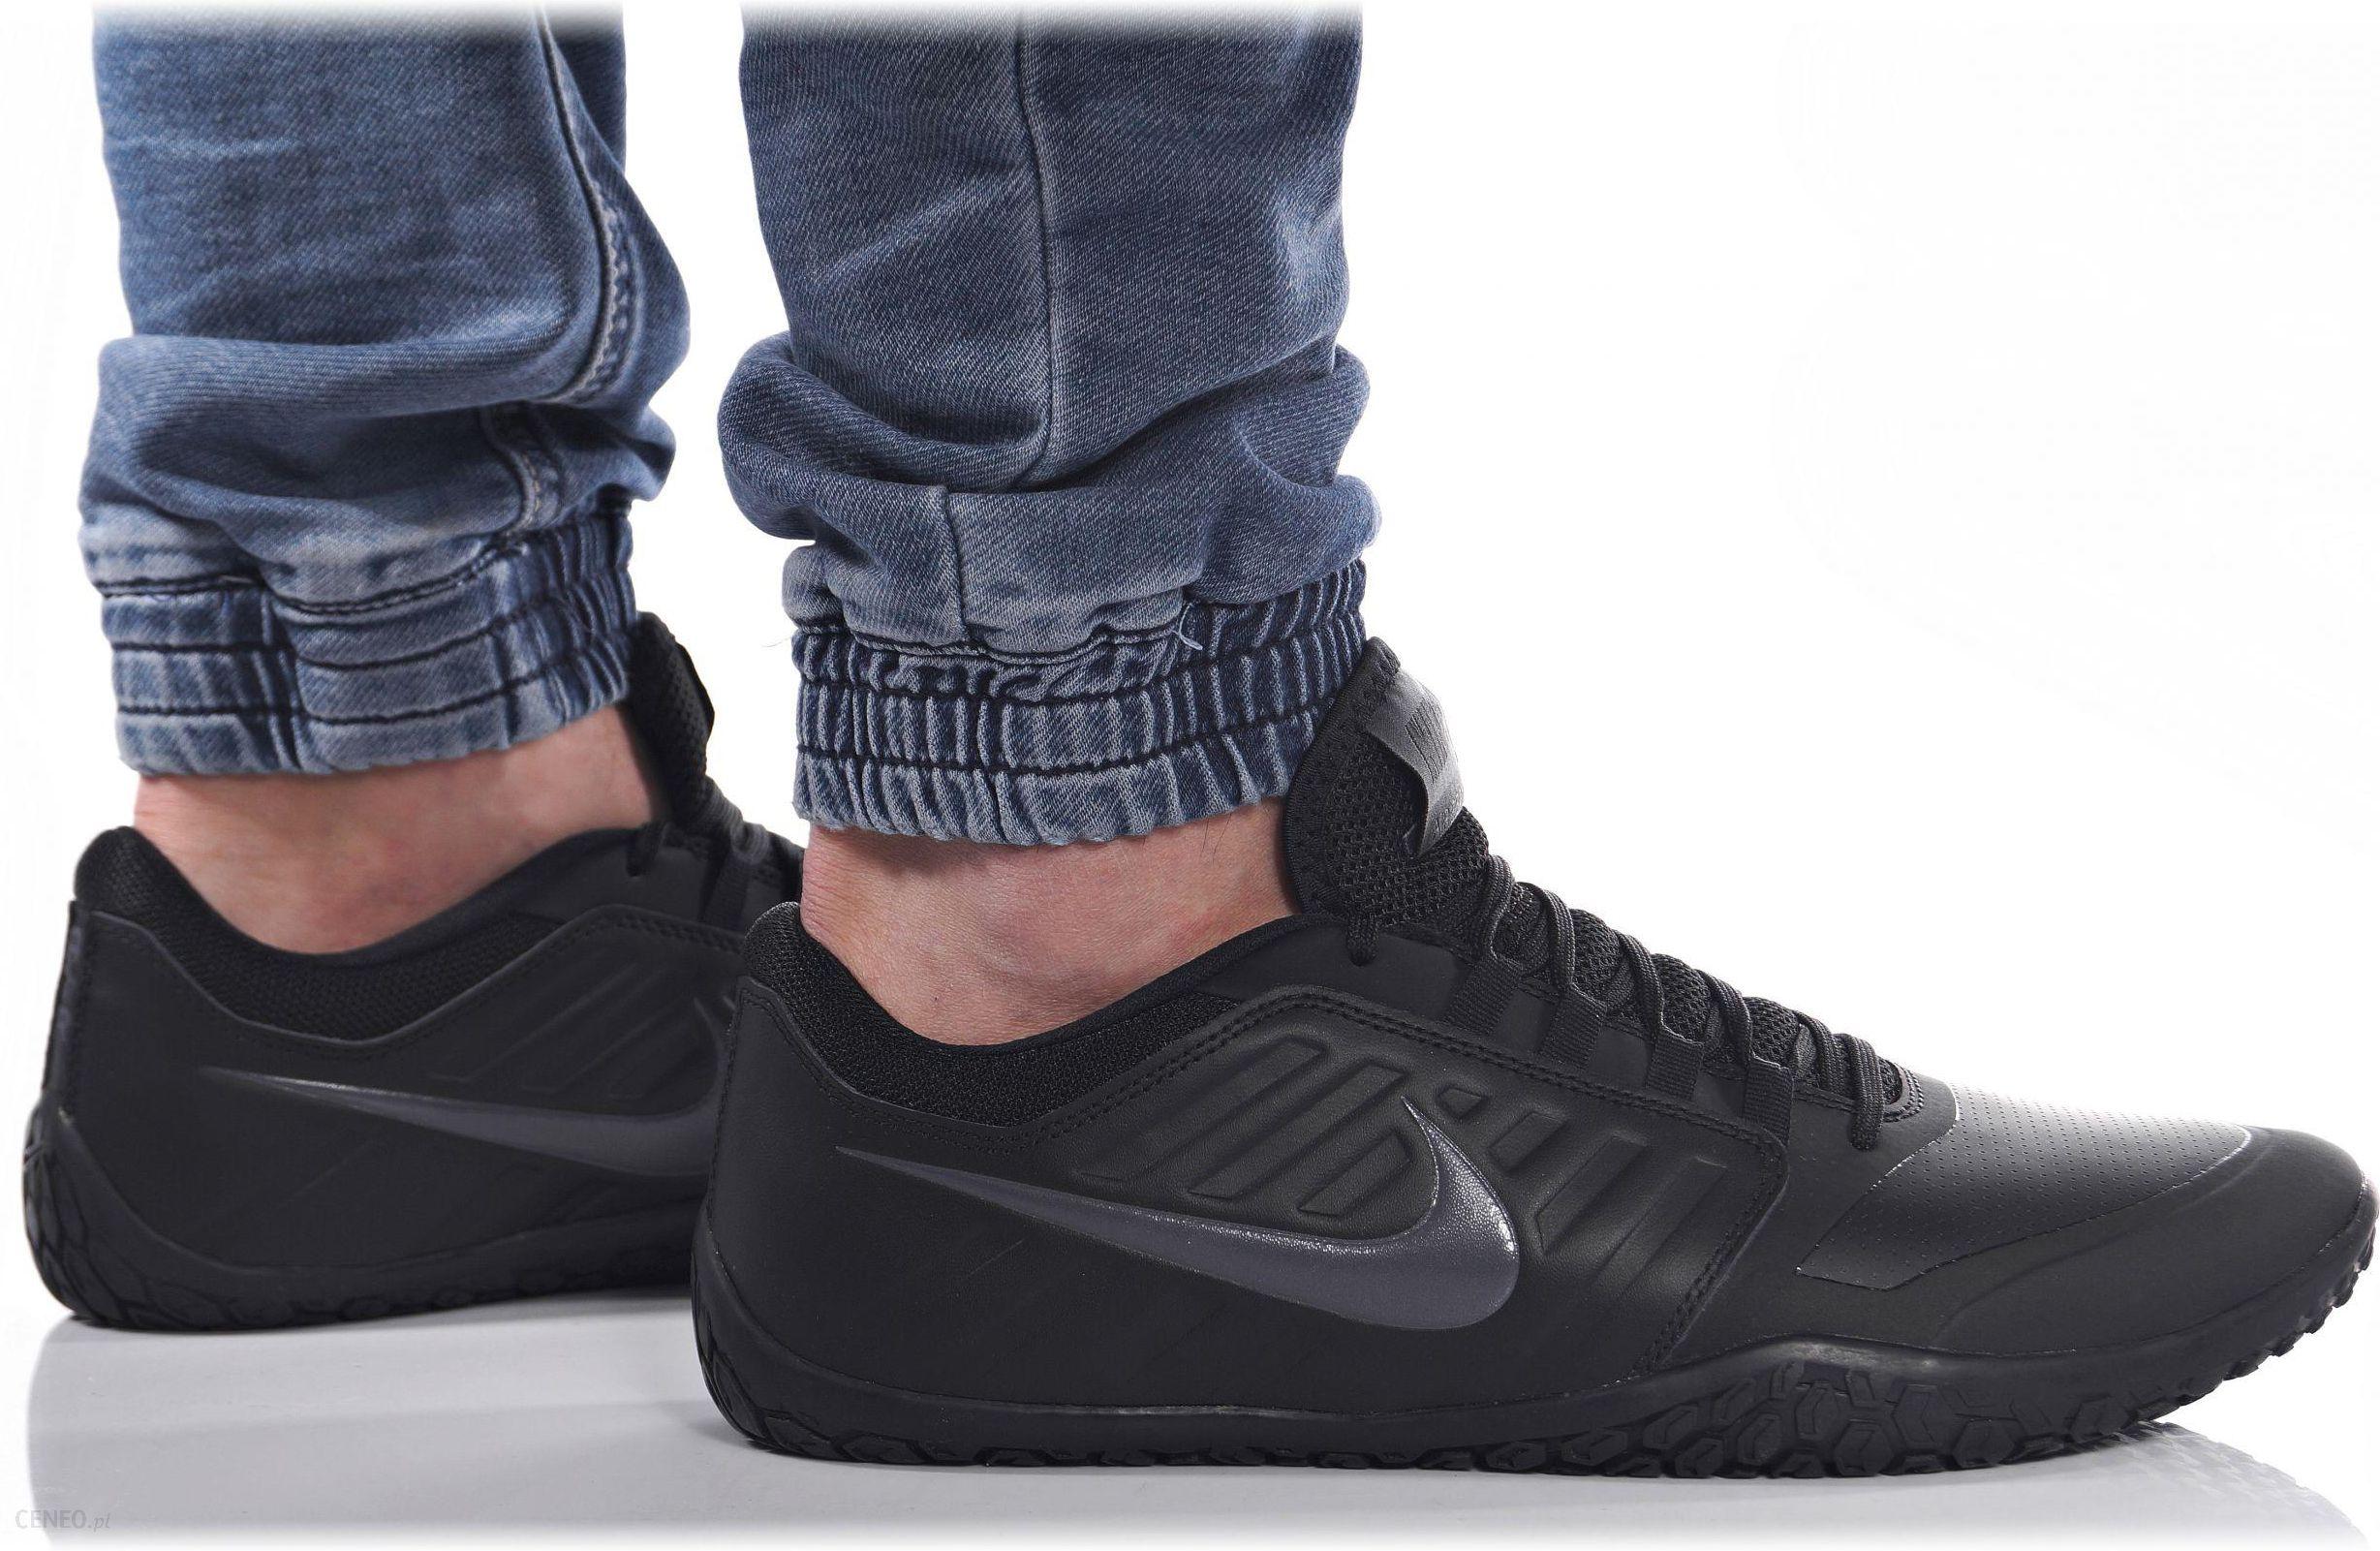 a11fcc74 Buty Nike Męskie Air Pernix 818970-001 Hit R. 41 - Ceny i opinie ...